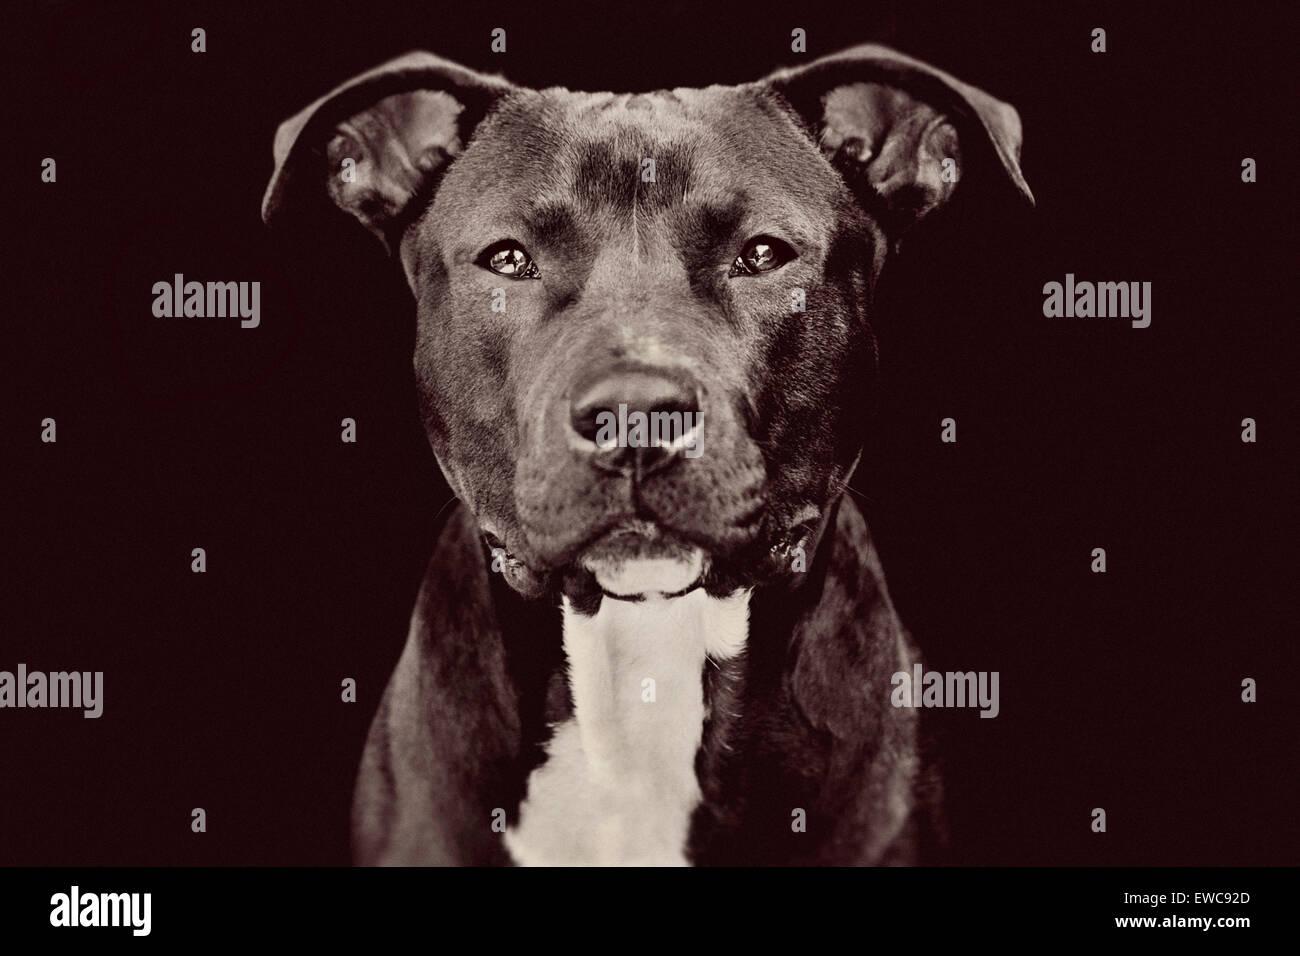 Retrato de estudio de un medio adulto grande Pitbull perro negro sobre fondo negro frente a cámara con ojos Imagen De Stock